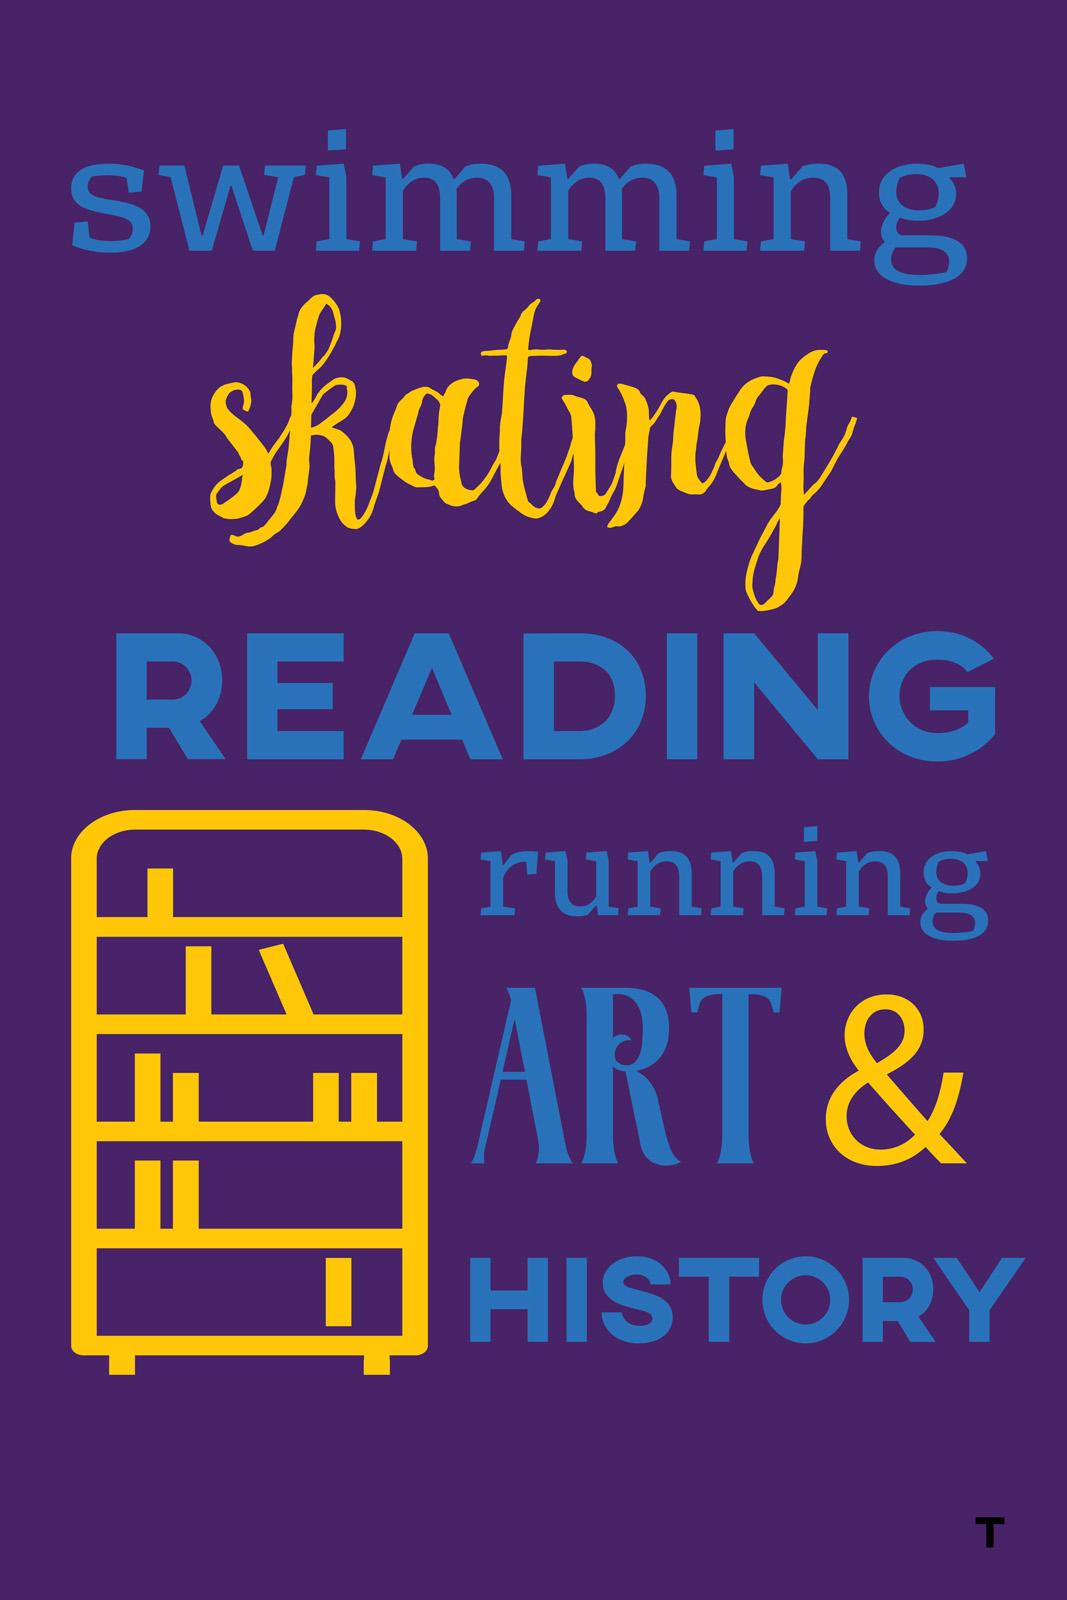 Swimming skating reading running art & history